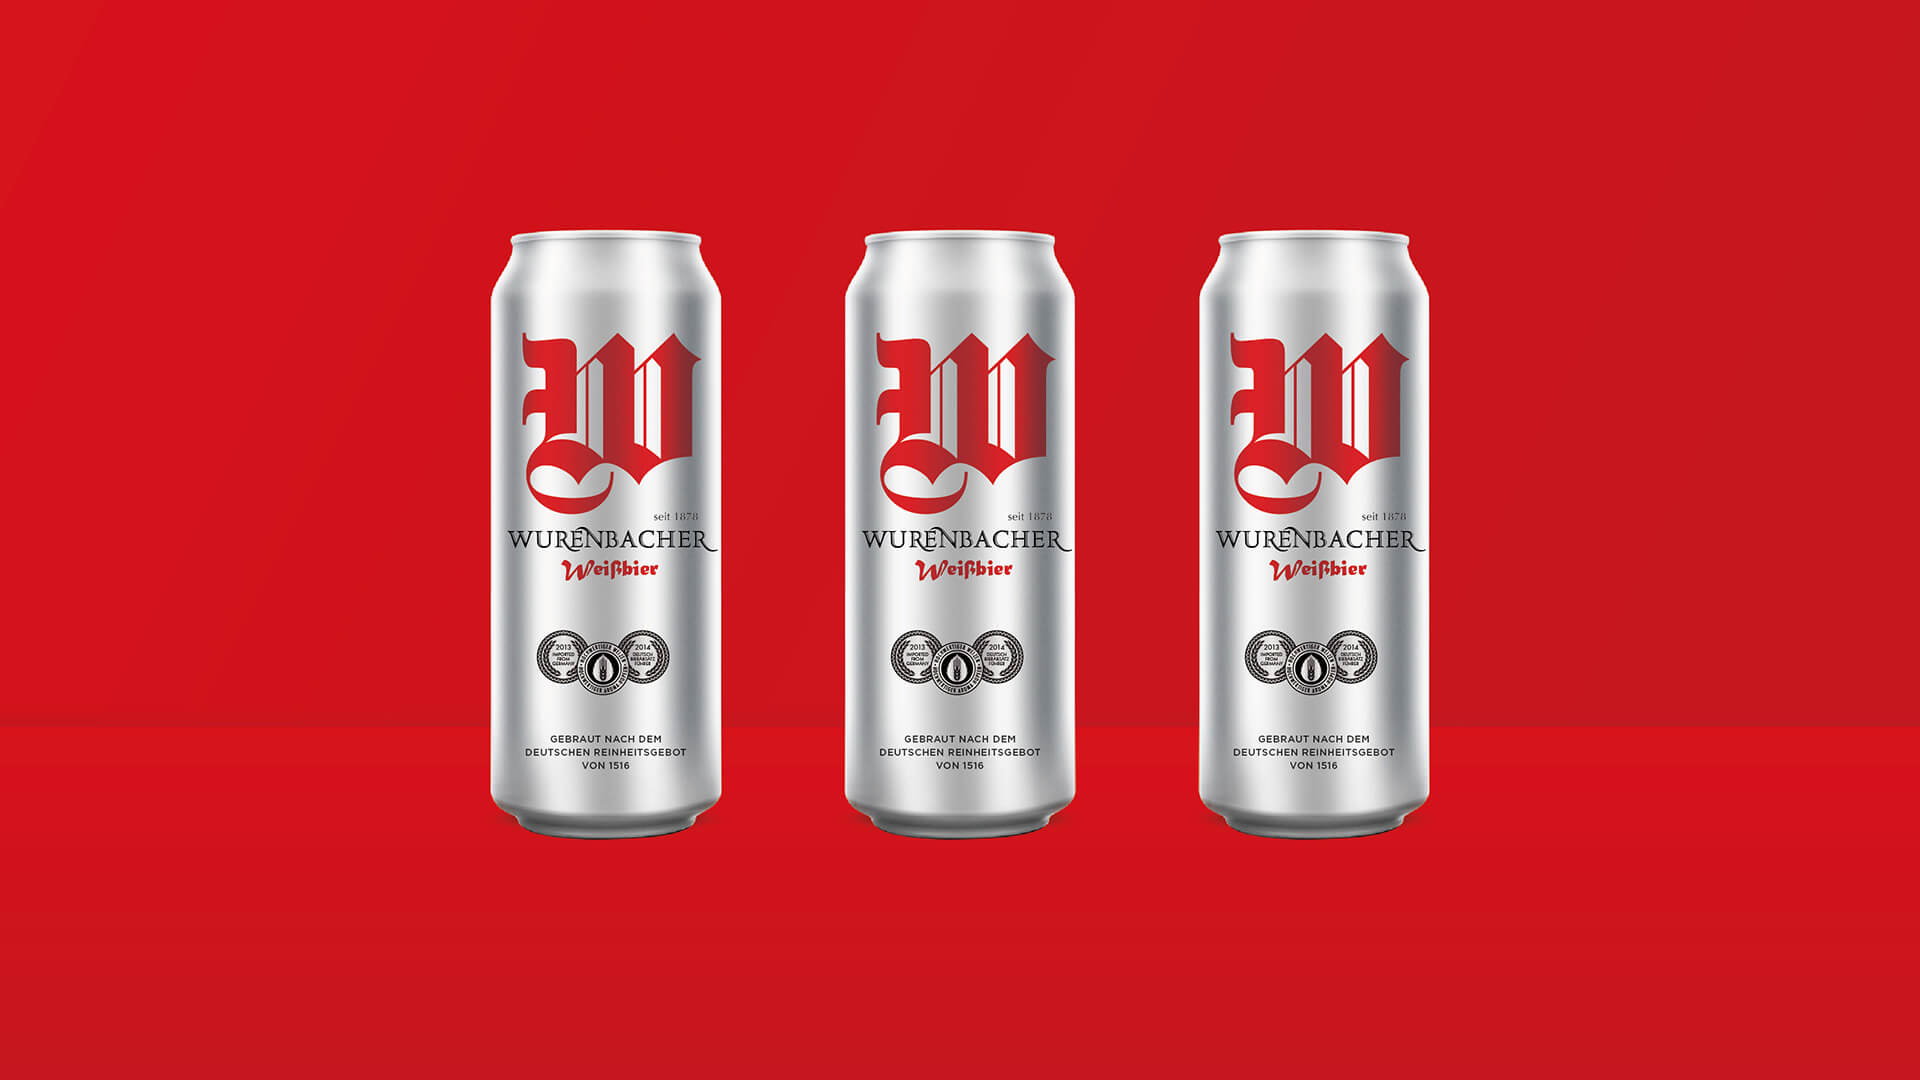 wurenbacher啤酒包装设计